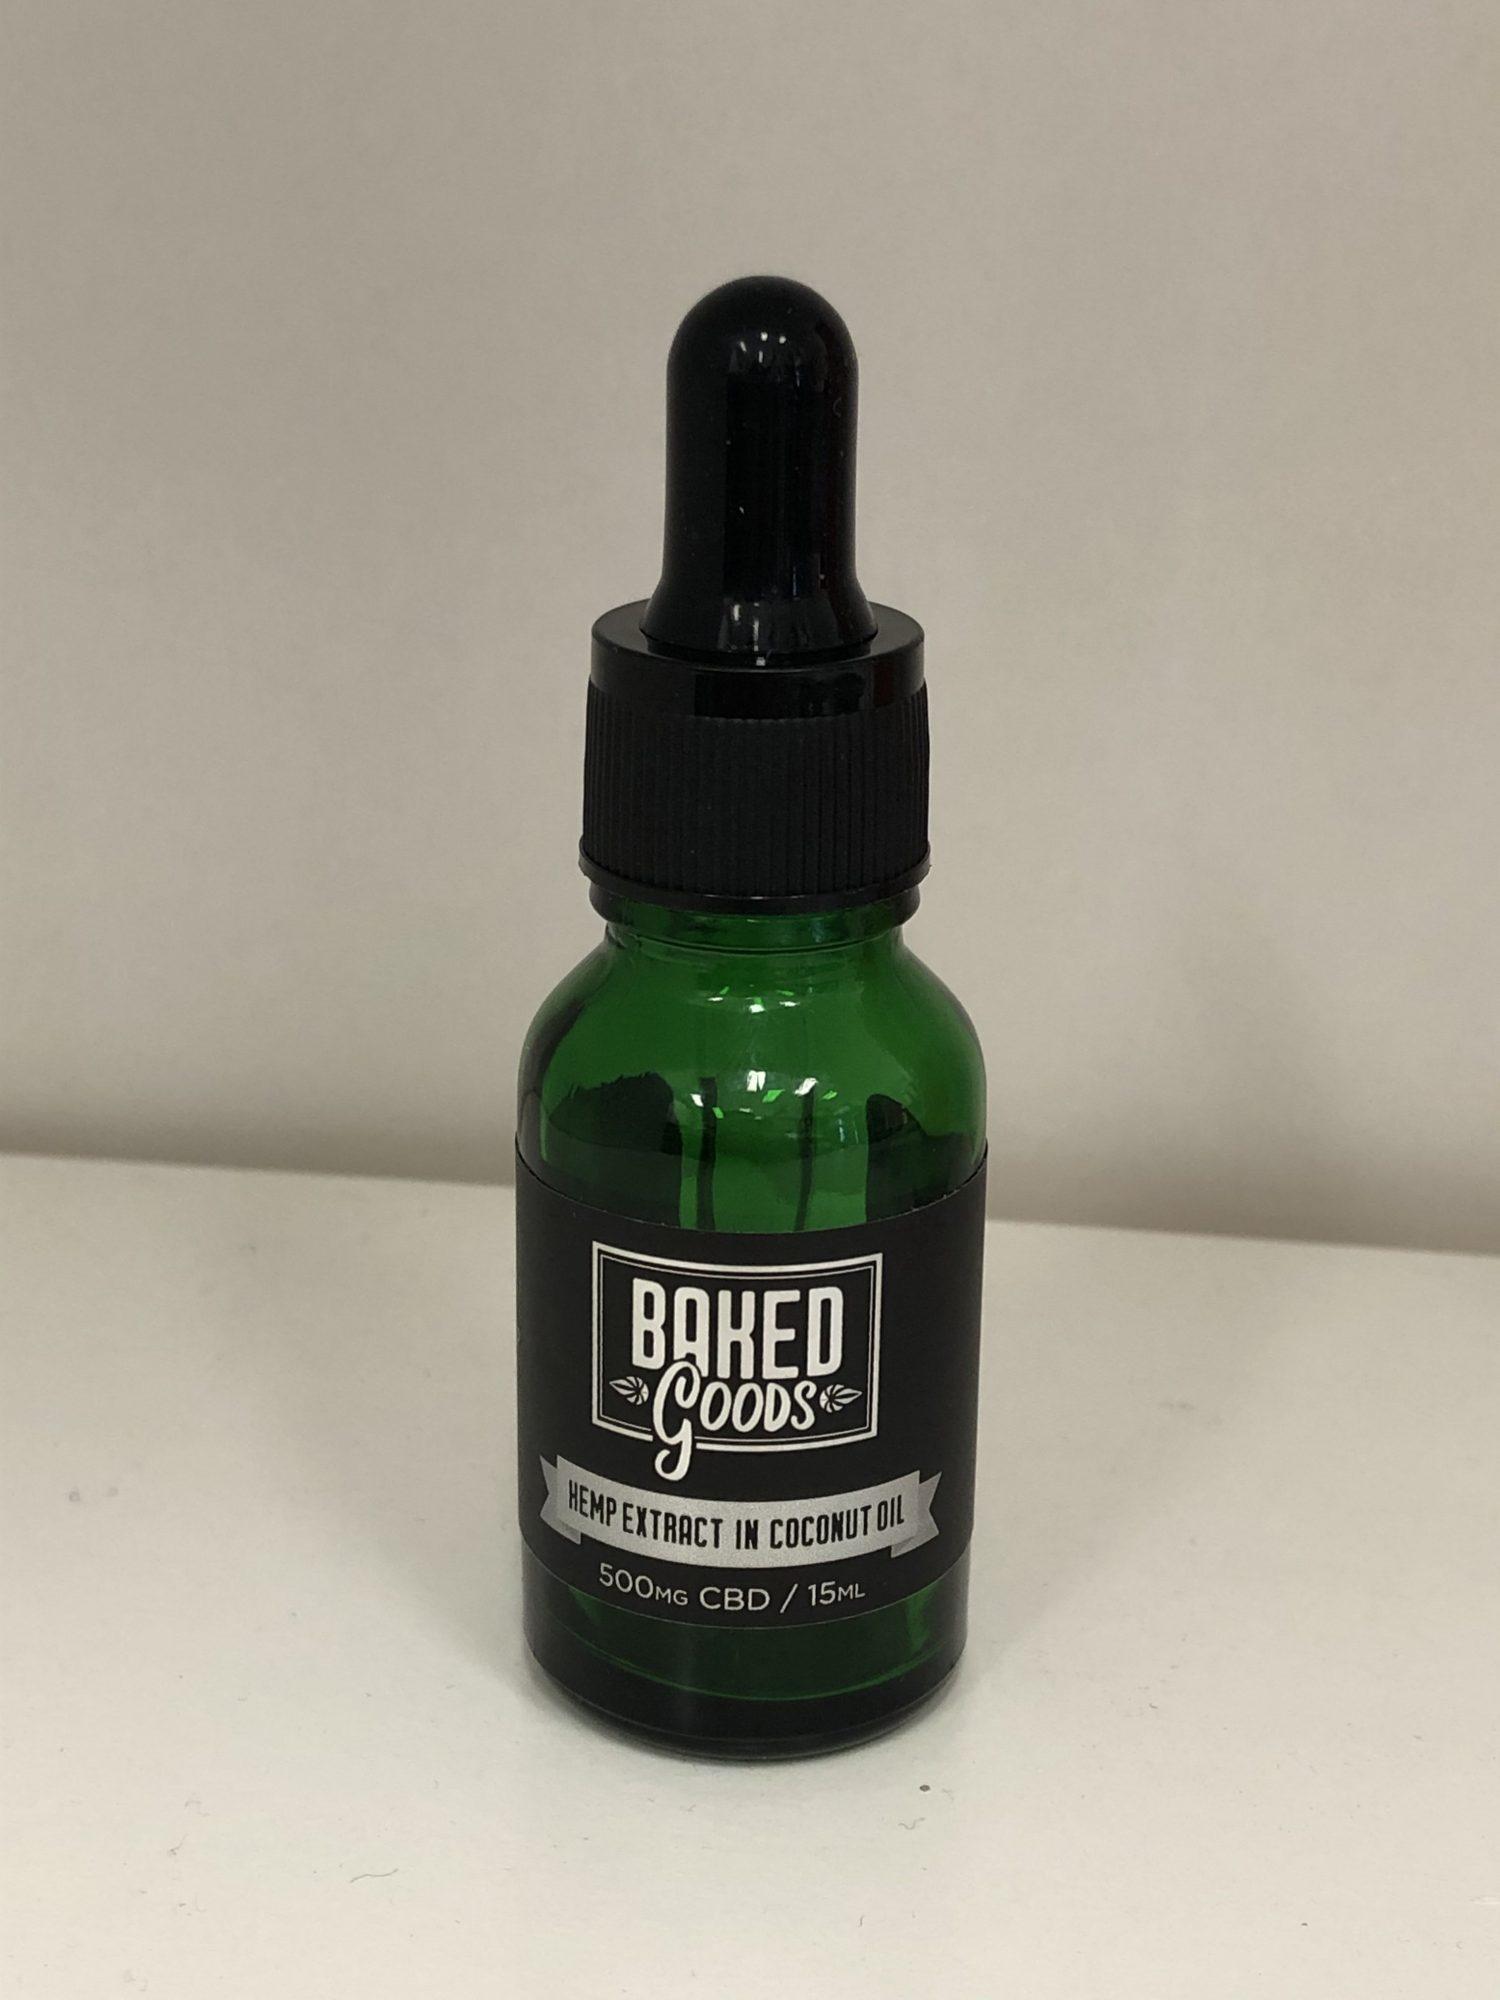 BAKED GOODS 500 mg hemp CBD 15 ml TRIAL SIZE